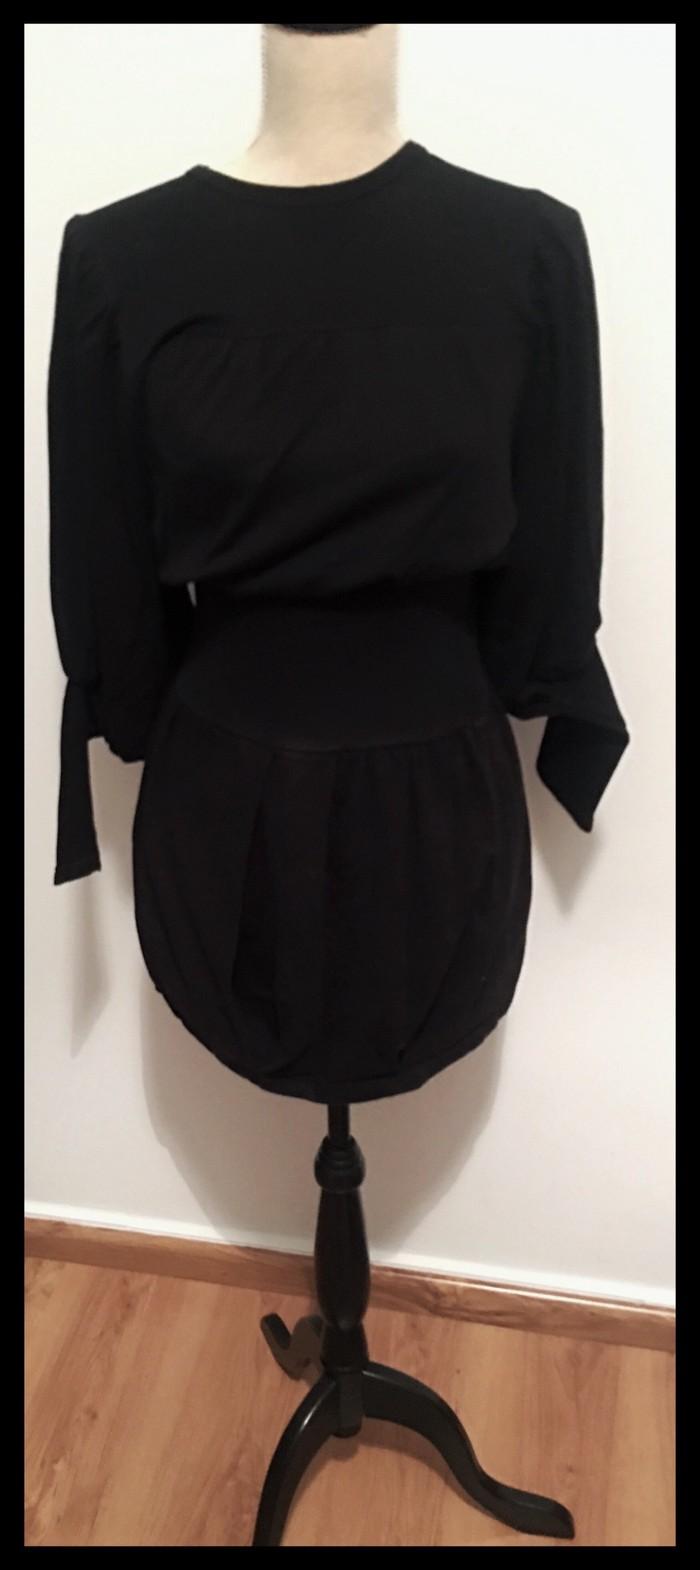 Lak by Gavalas φορεμα κοντο μαυρο (small-medium). Photo 0